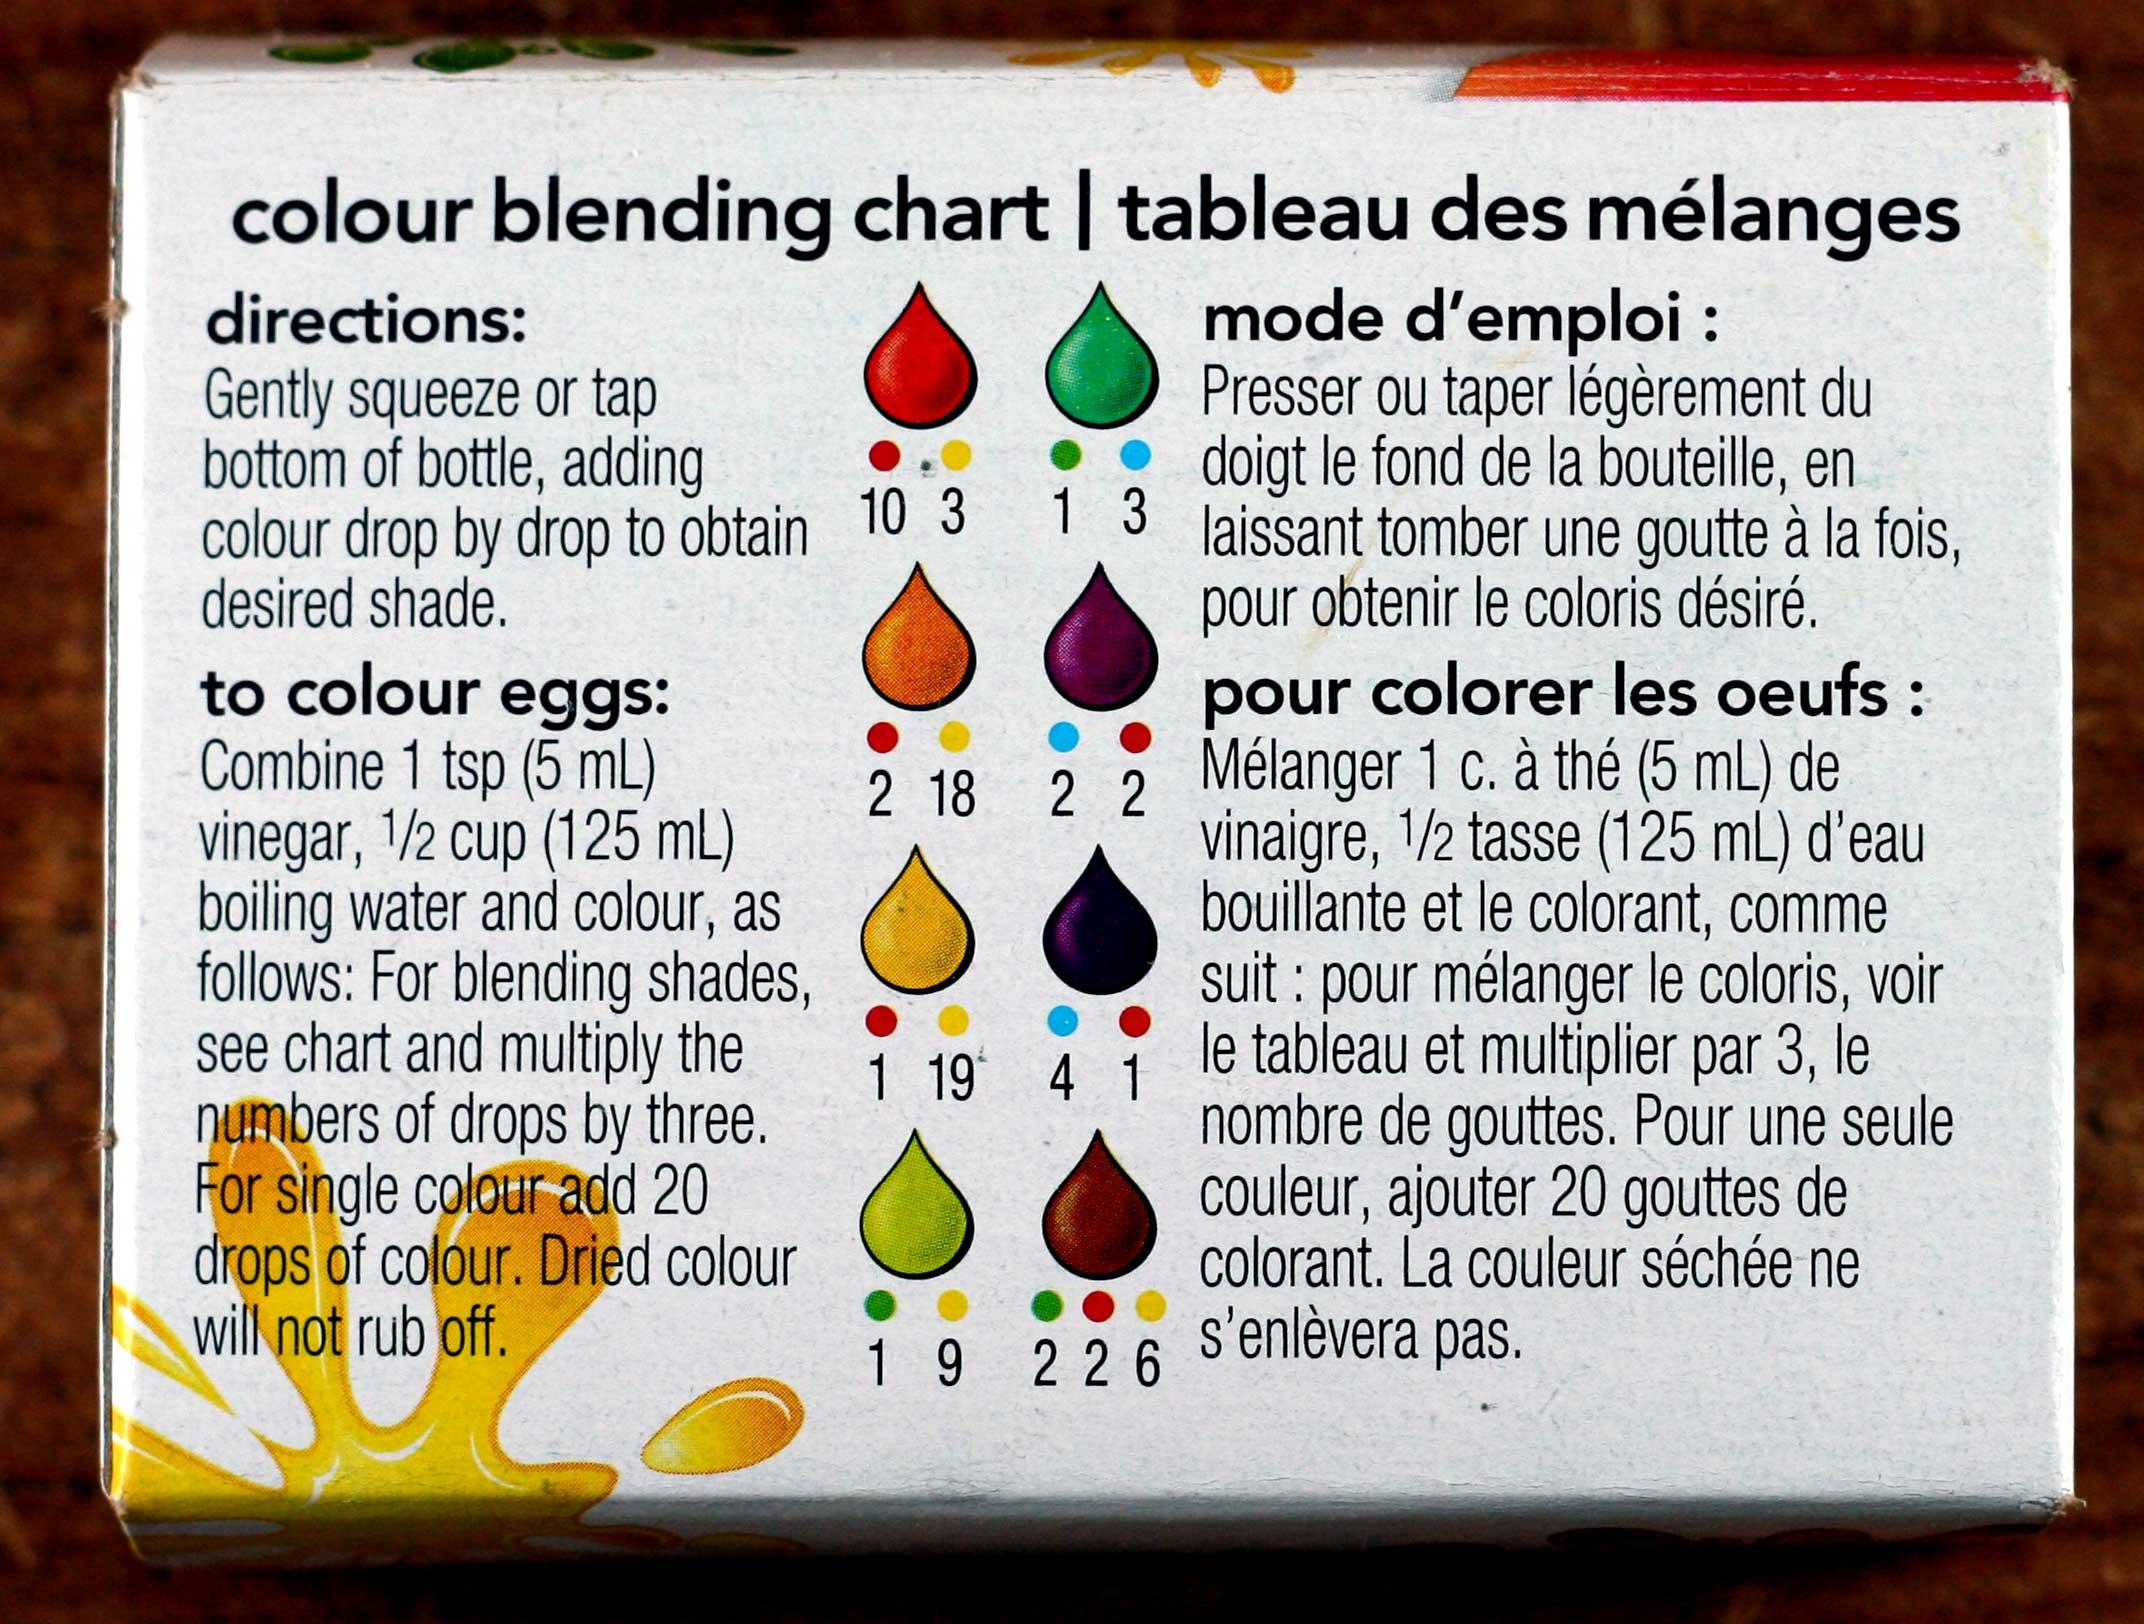 Food colour blending chart